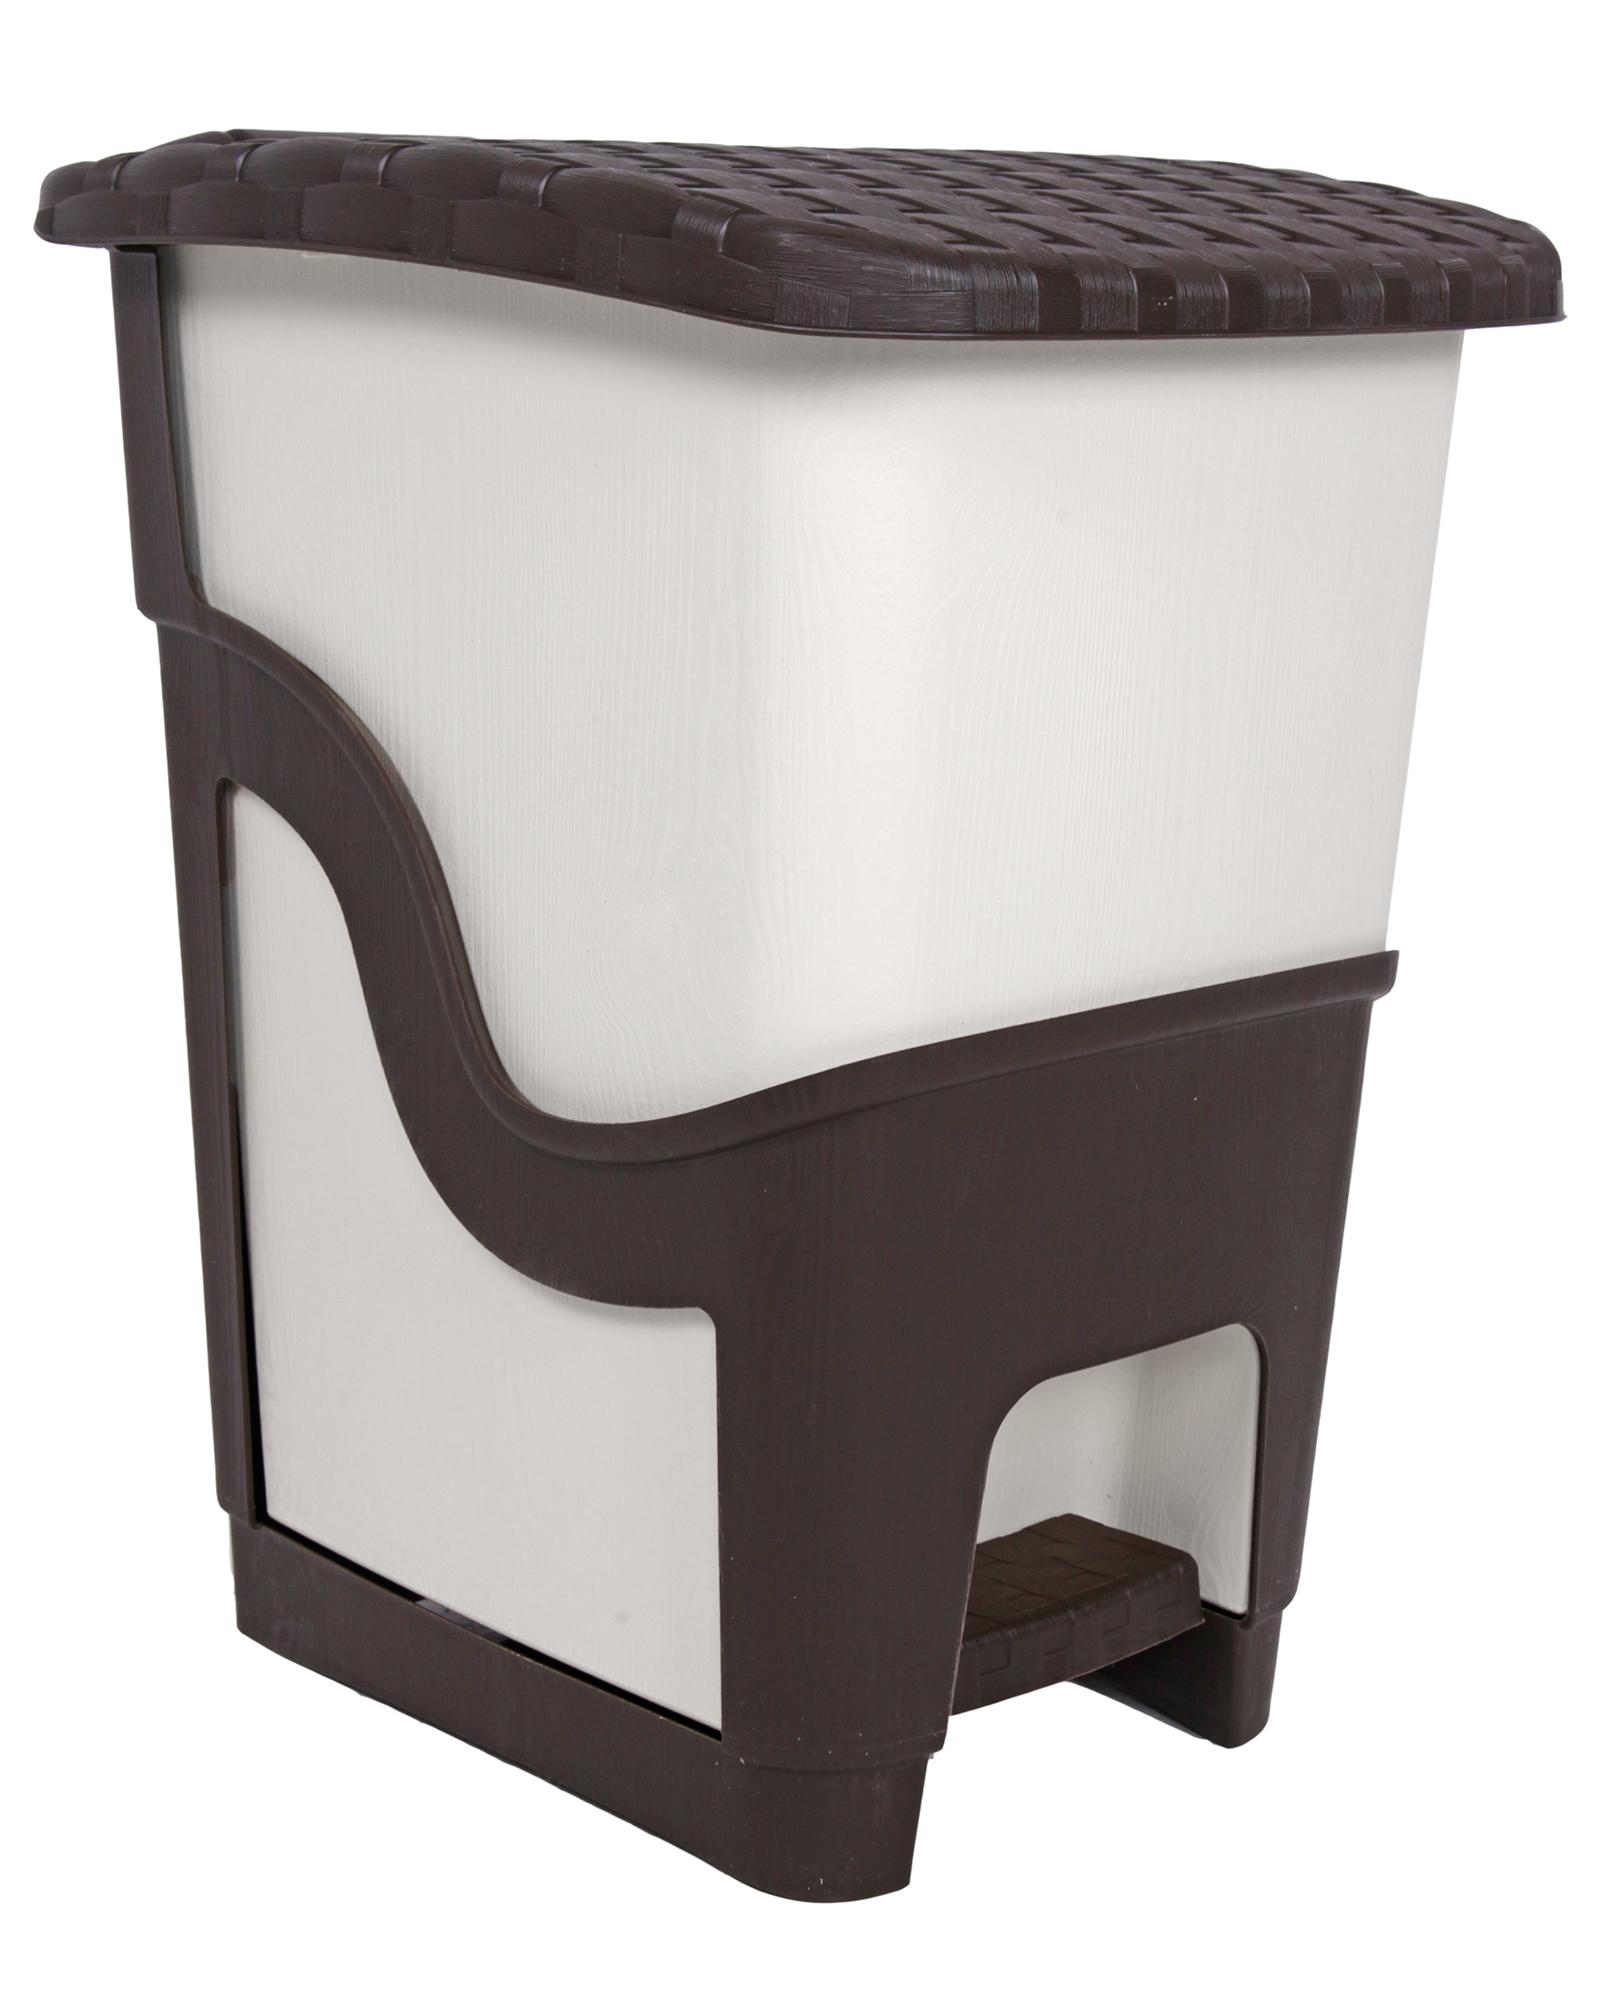 ondis24 m lleimer rattan 18 liter beige braun g nstig. Black Bedroom Furniture Sets. Home Design Ideas